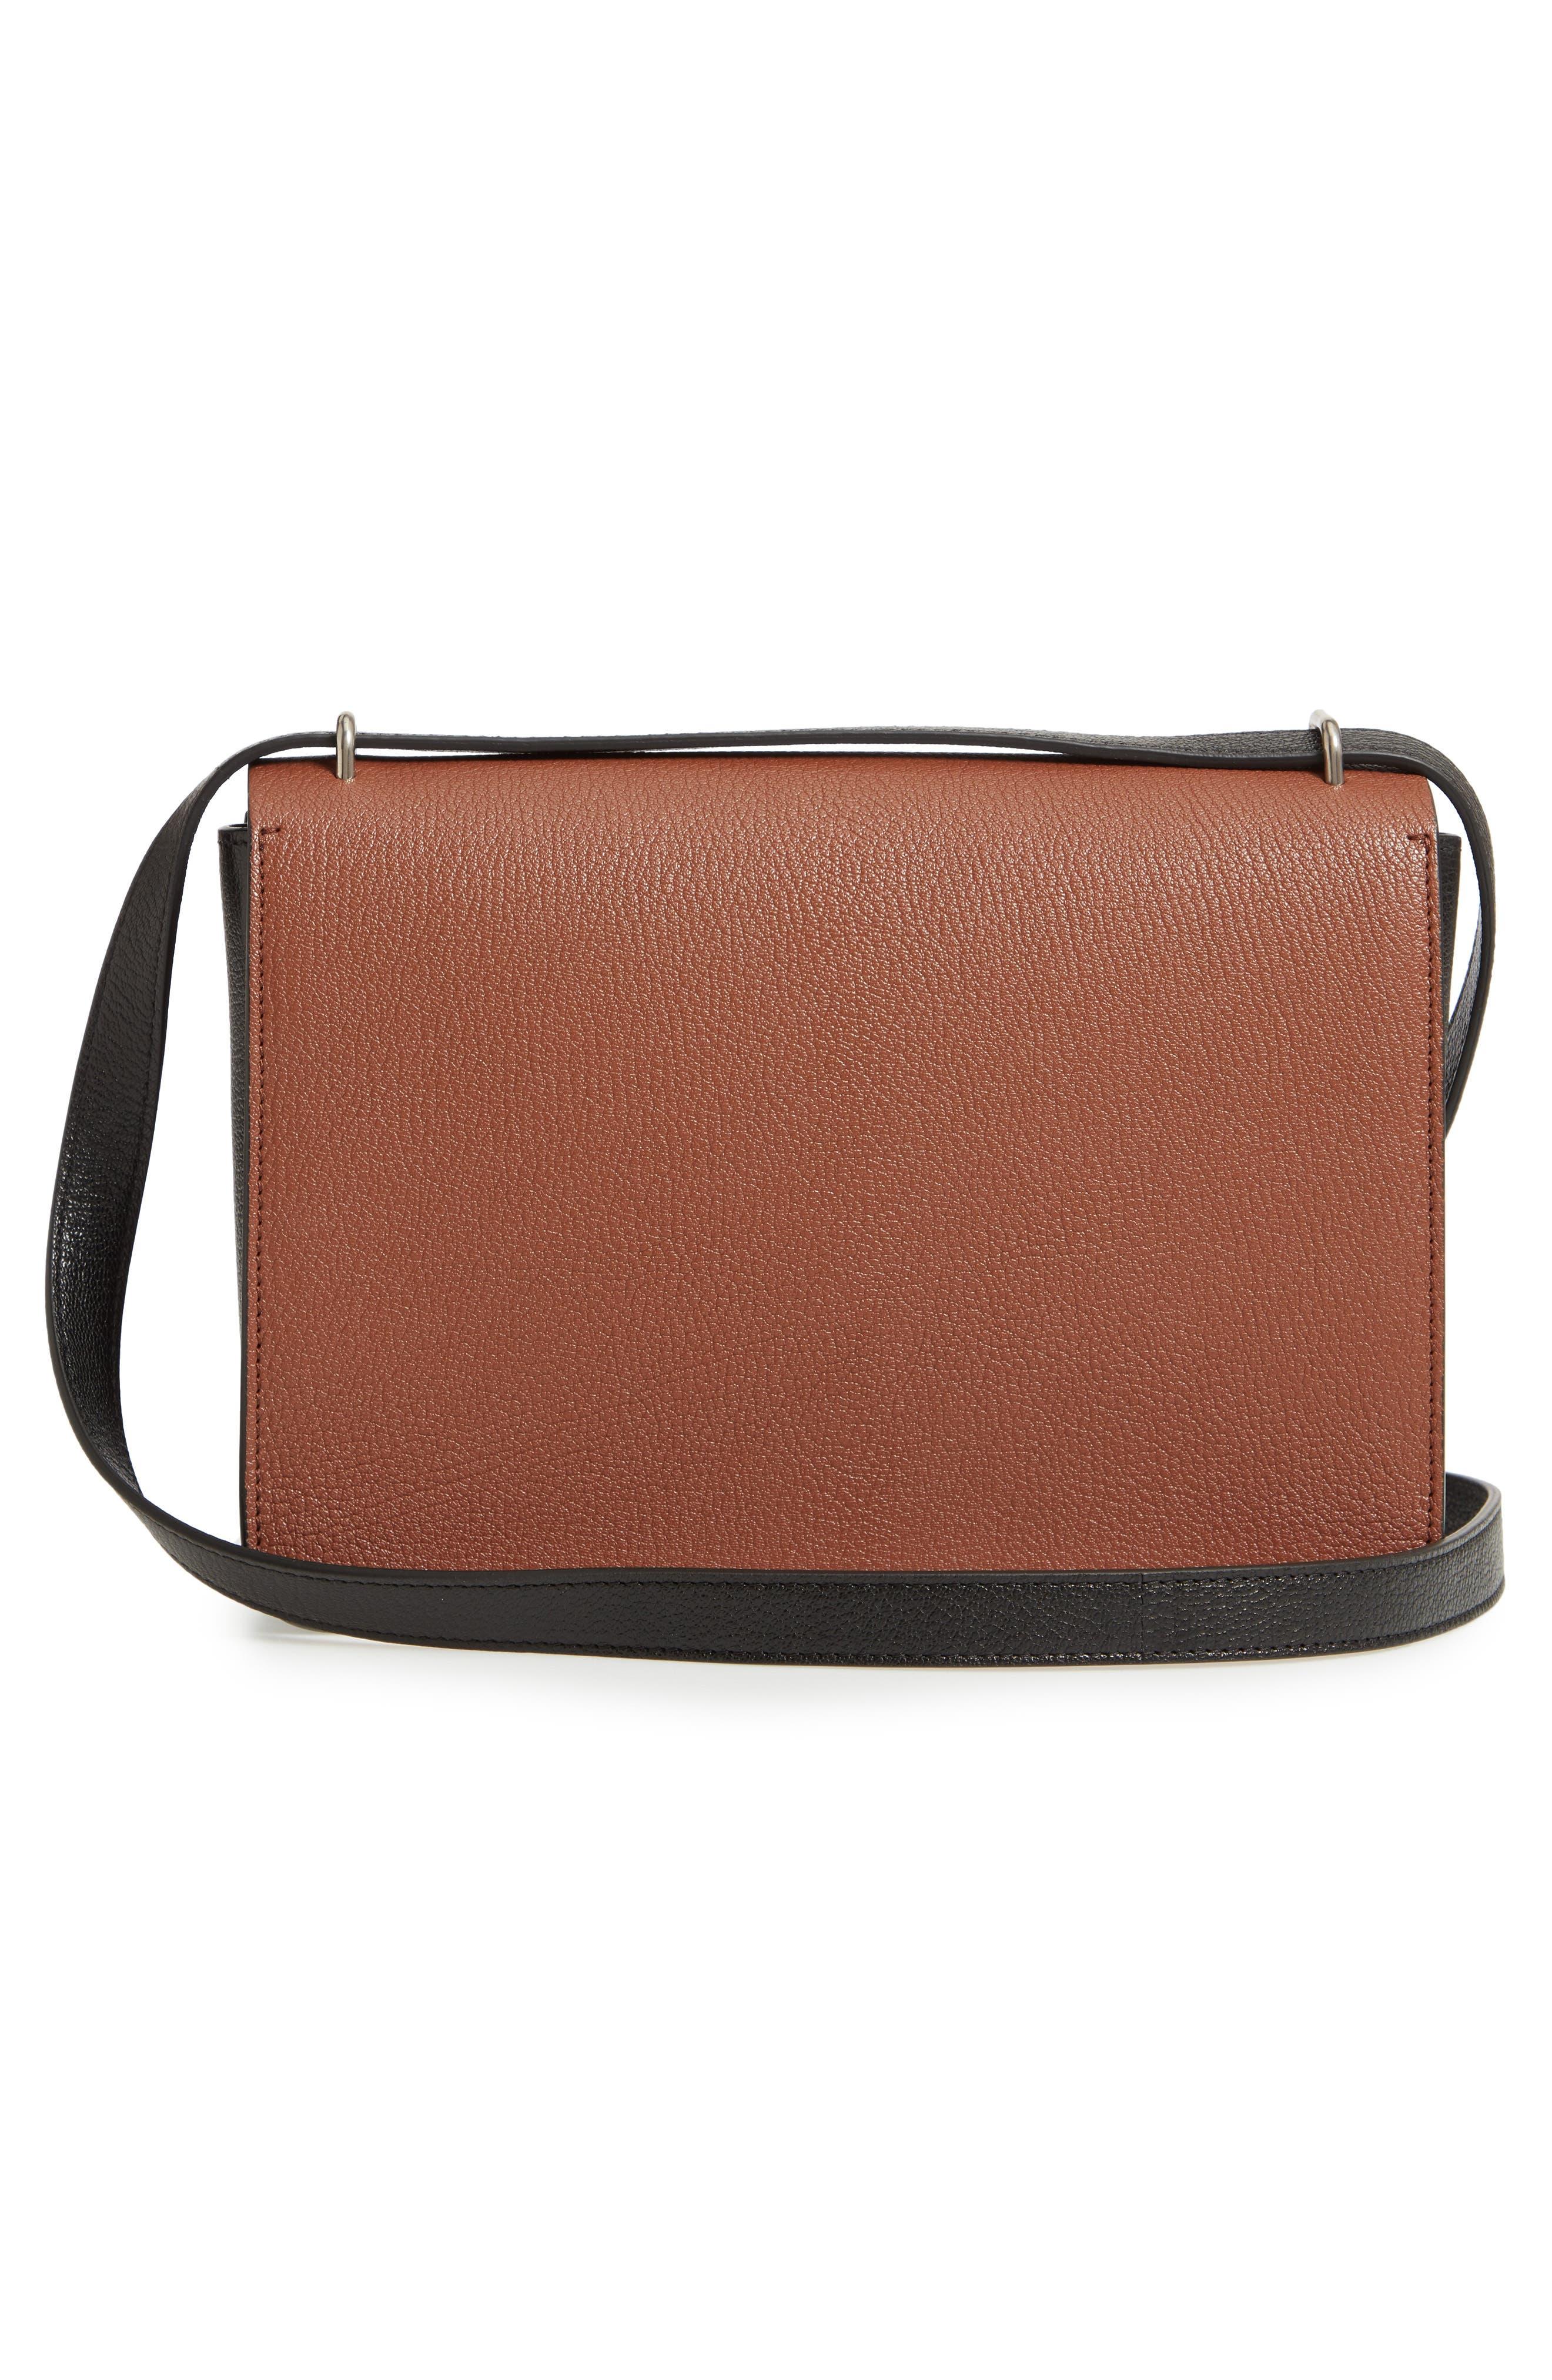 Medium D-Ring Vintage Check & Leather Crossbody Bag,                             Alternate thumbnail 3, color,                             TAN/ BLACK